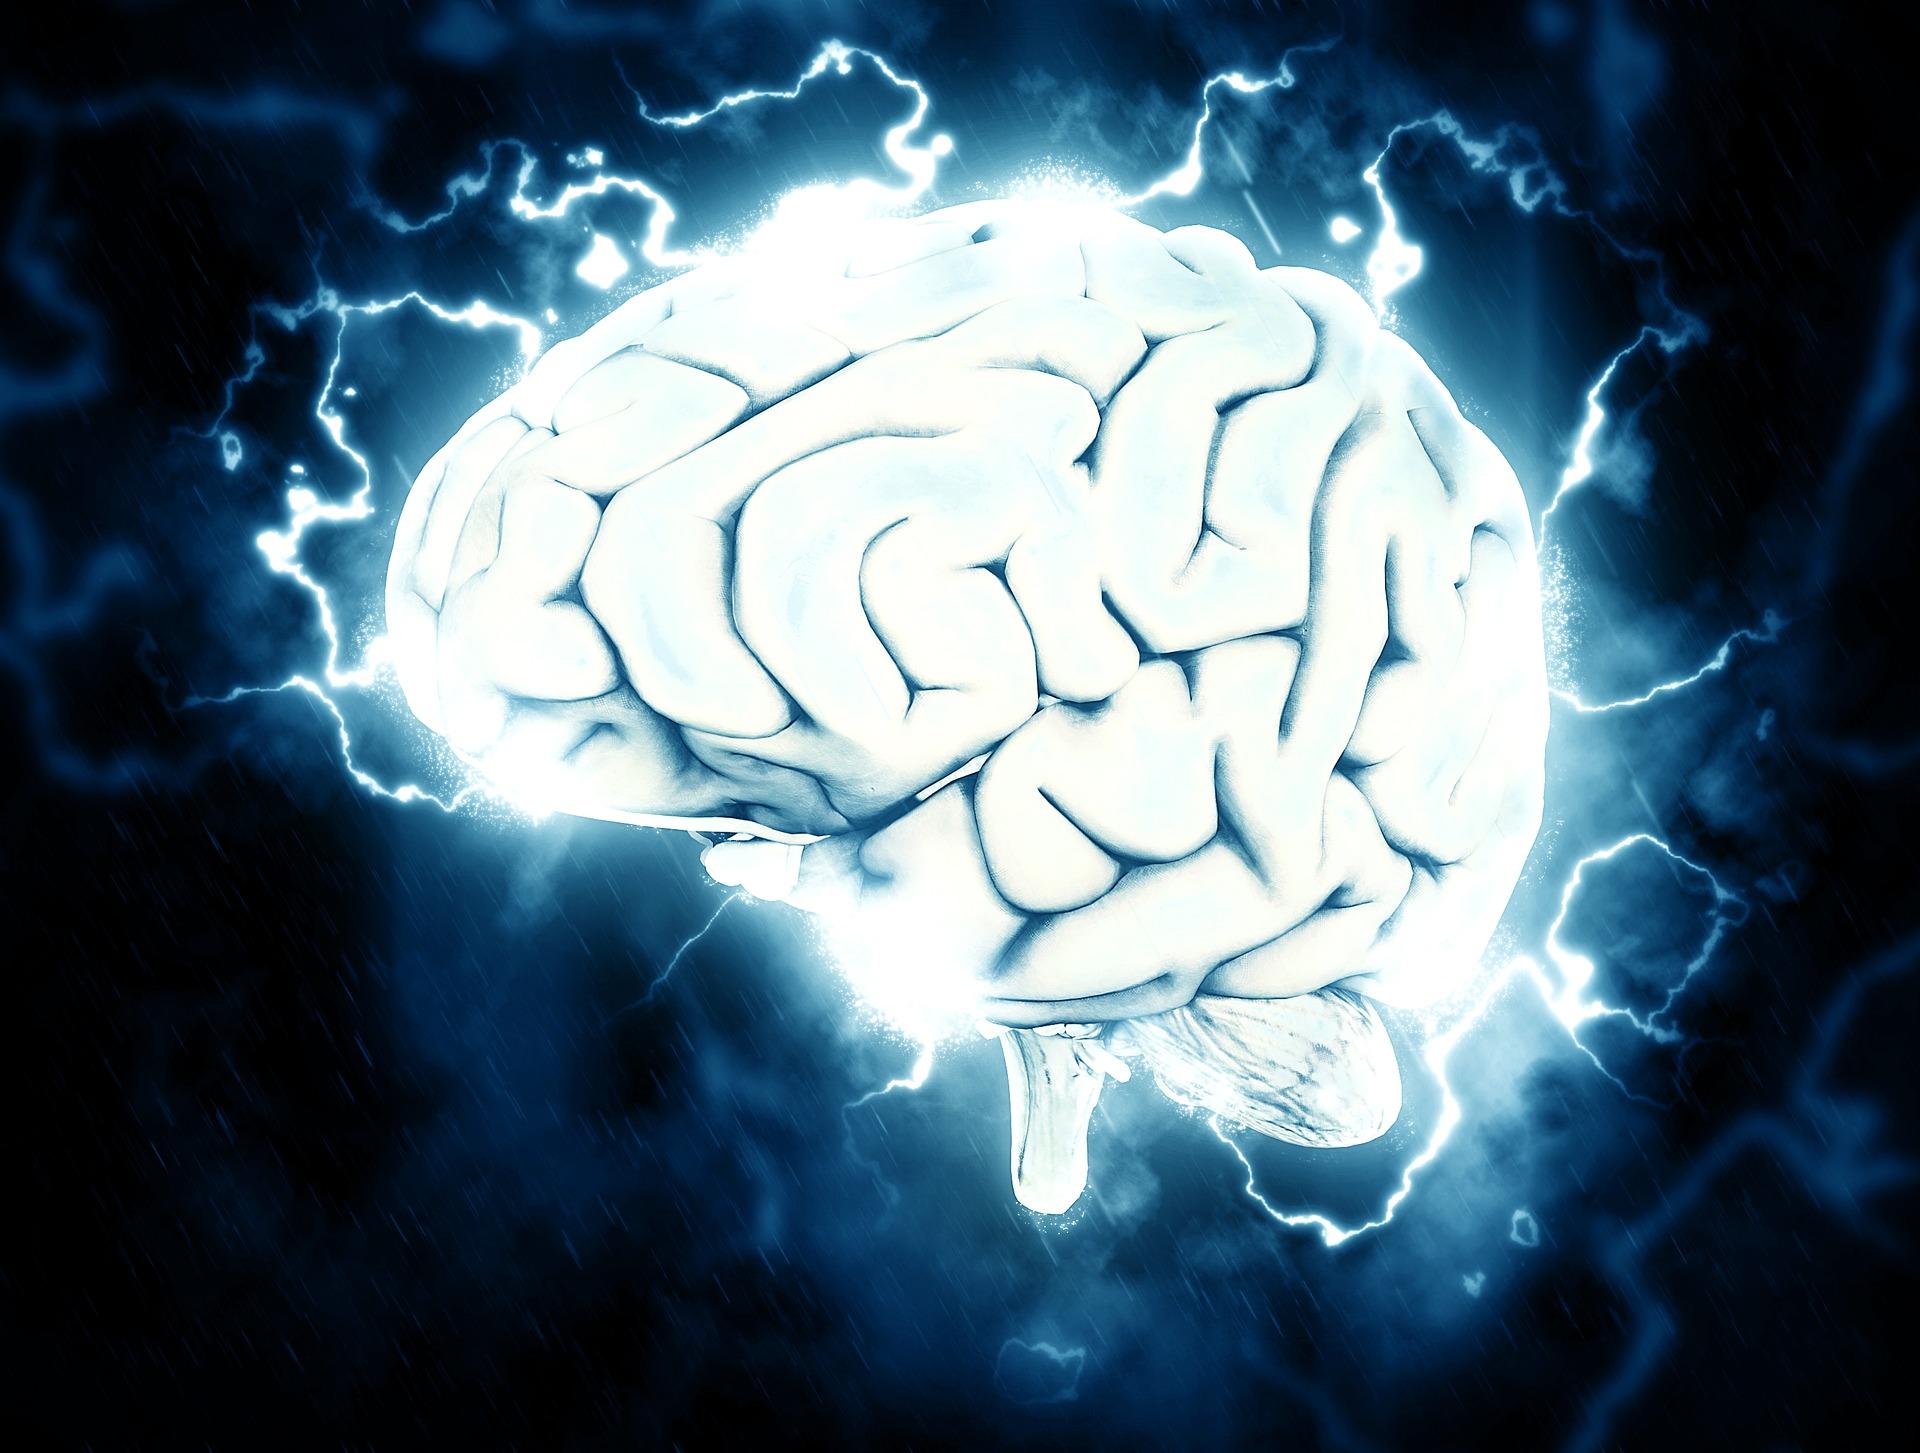 Infusalounge Wellness Spa Brain & Mood Health IV